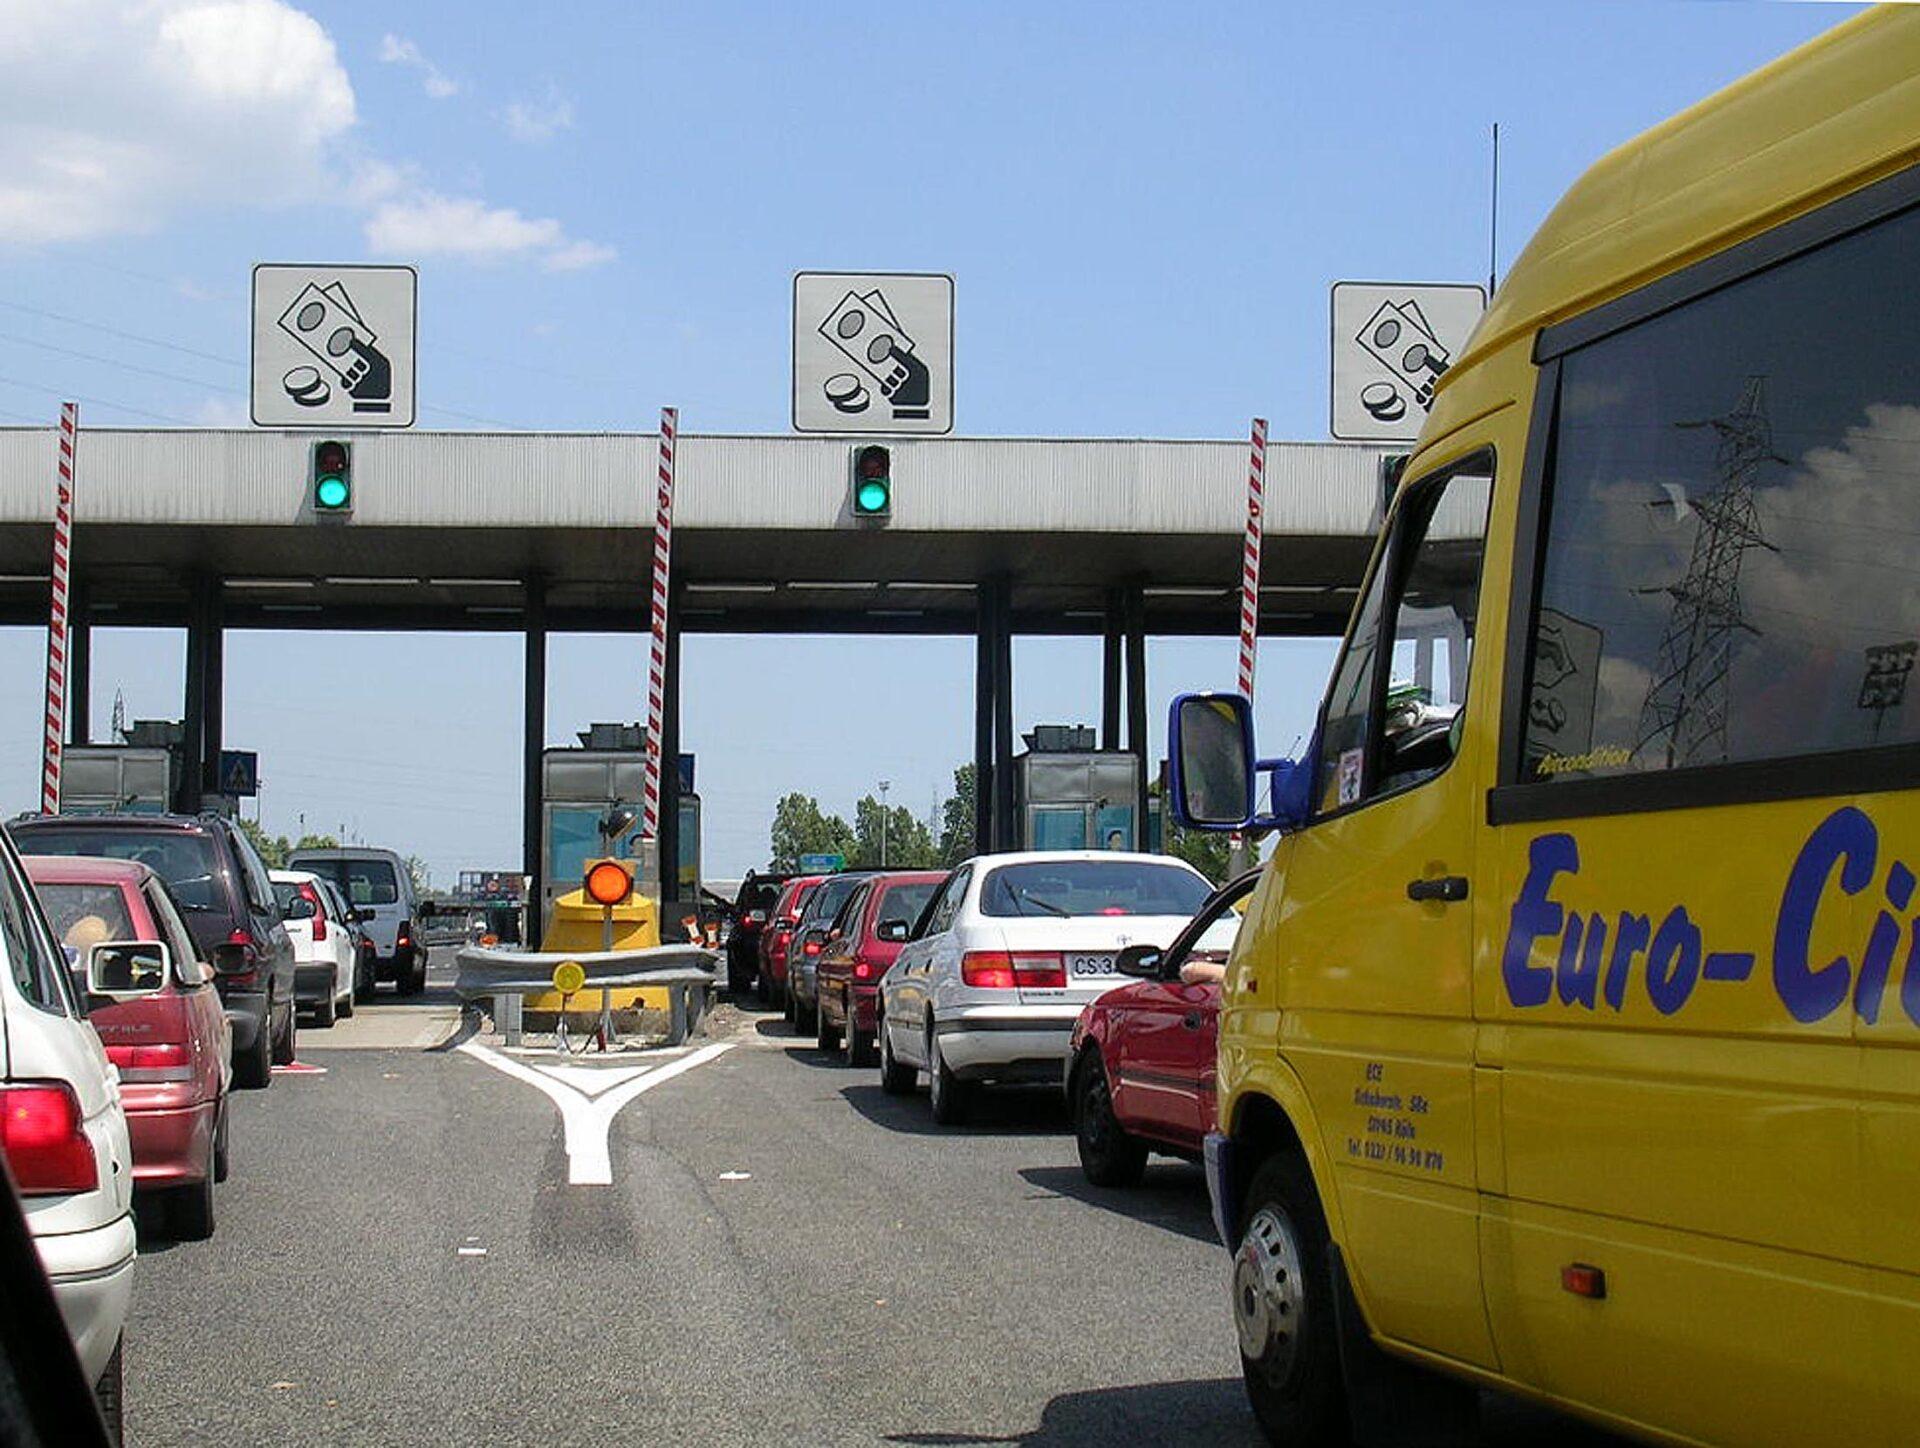 db6cb89ab97 Europese samenwerking op de tolwegen: Gemak dient de mens - FACTS FOUND